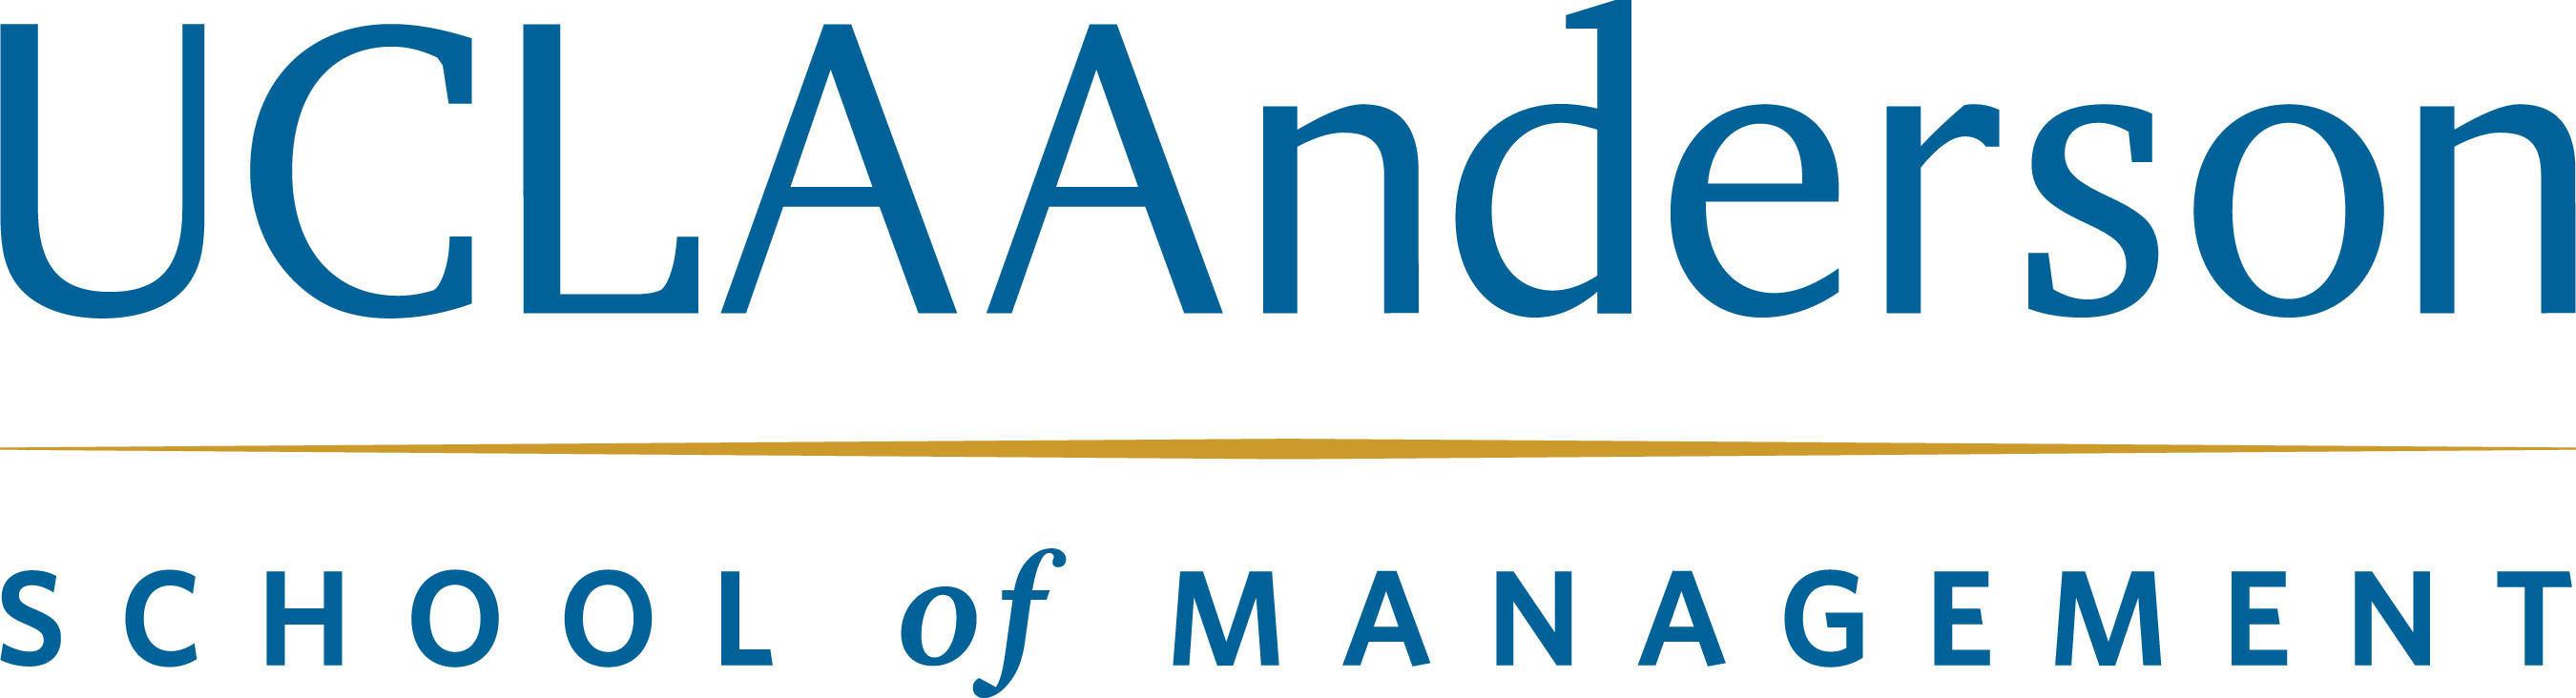 UCLA Anderson School of Management. (PRNewsFoto/UCLA Anderson School of Management)